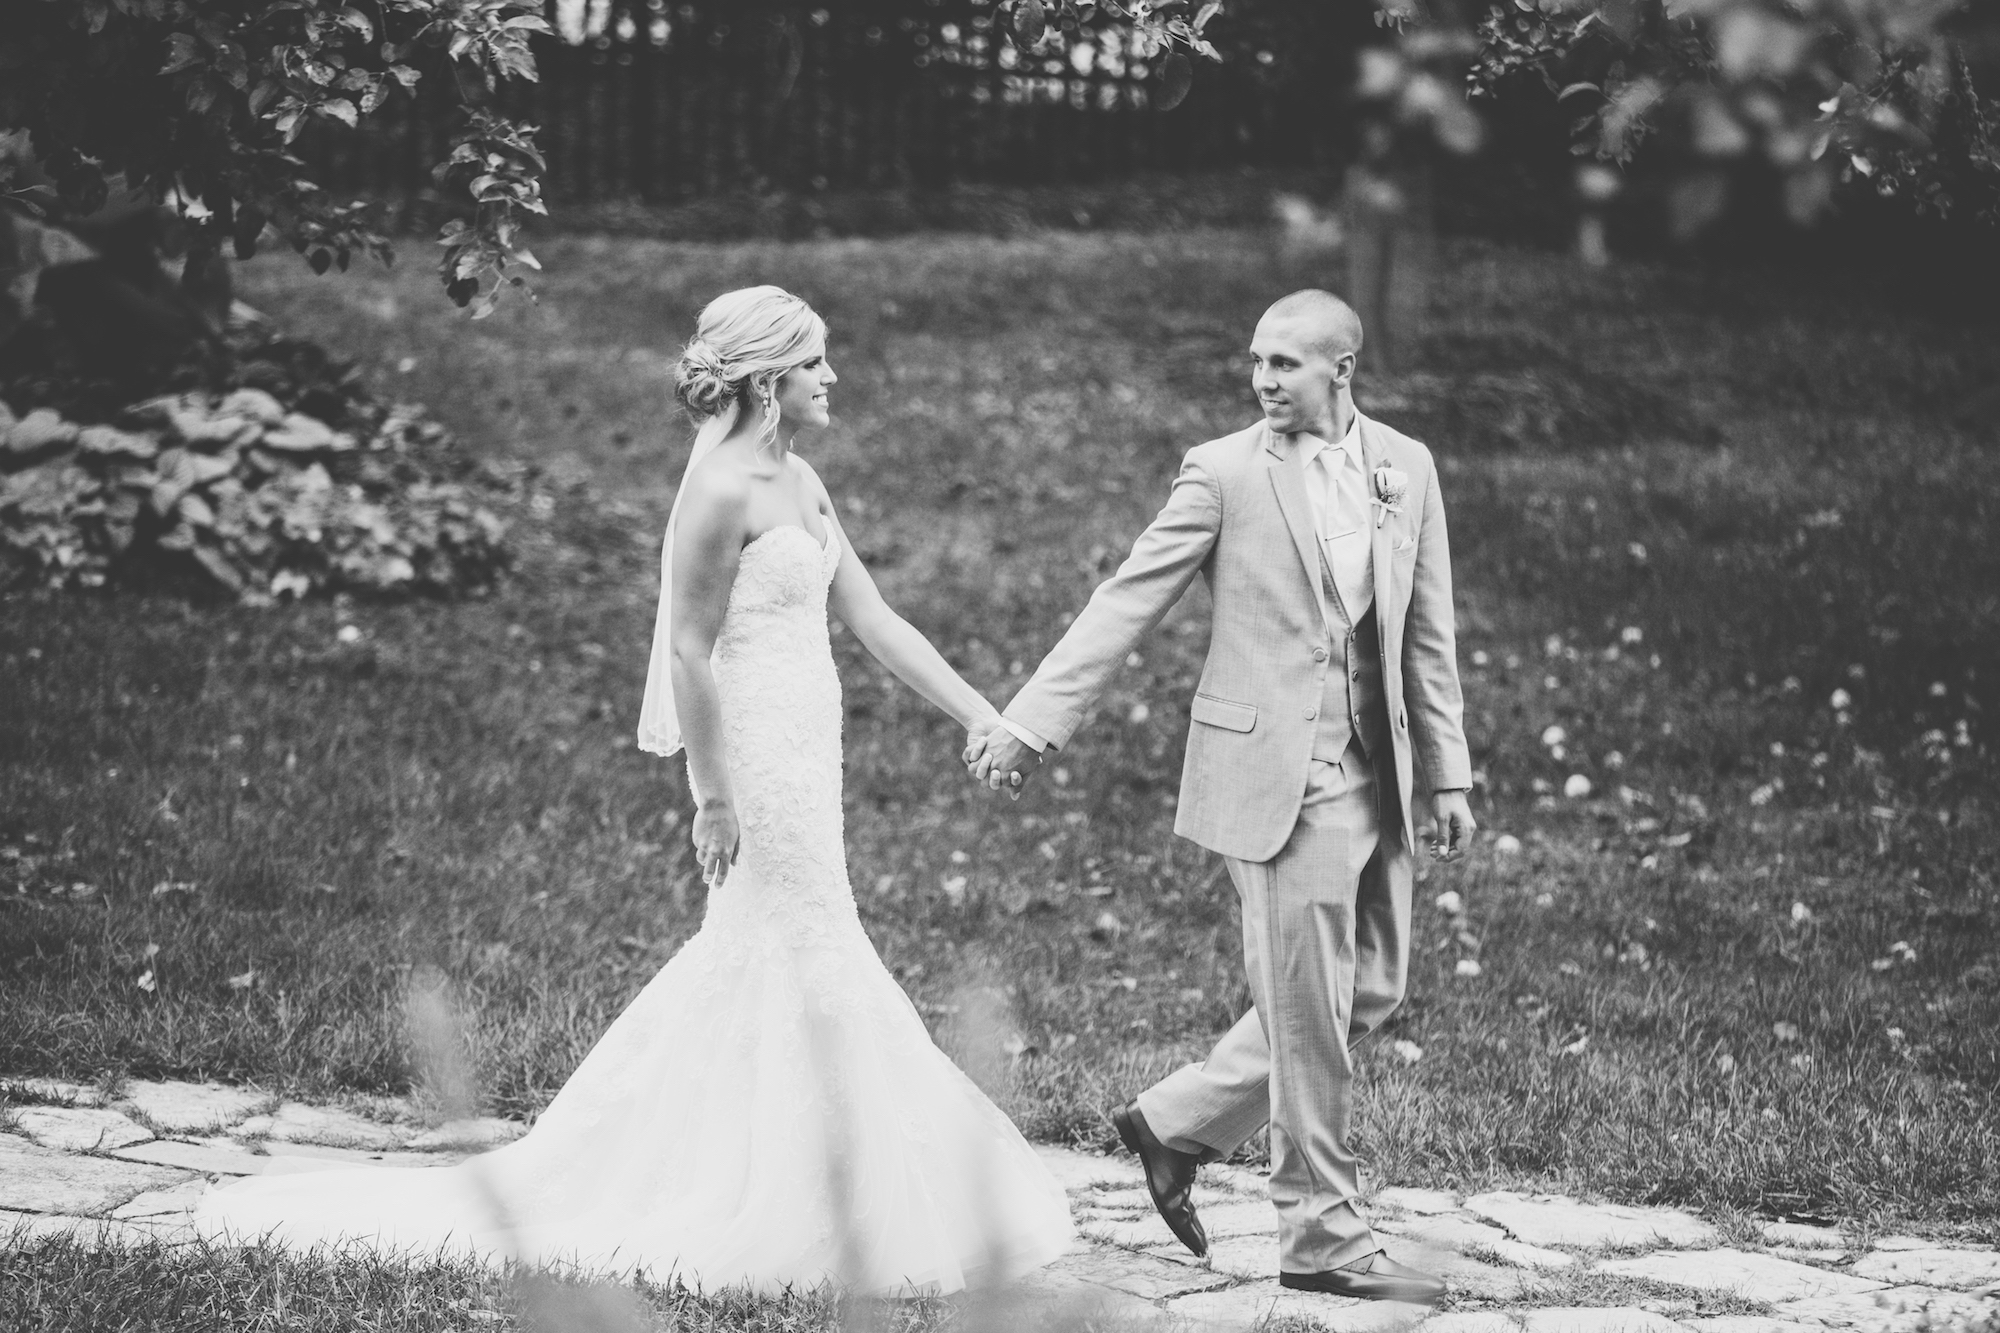 acowsay-cinema-minneapolis-wedding-25.jpg